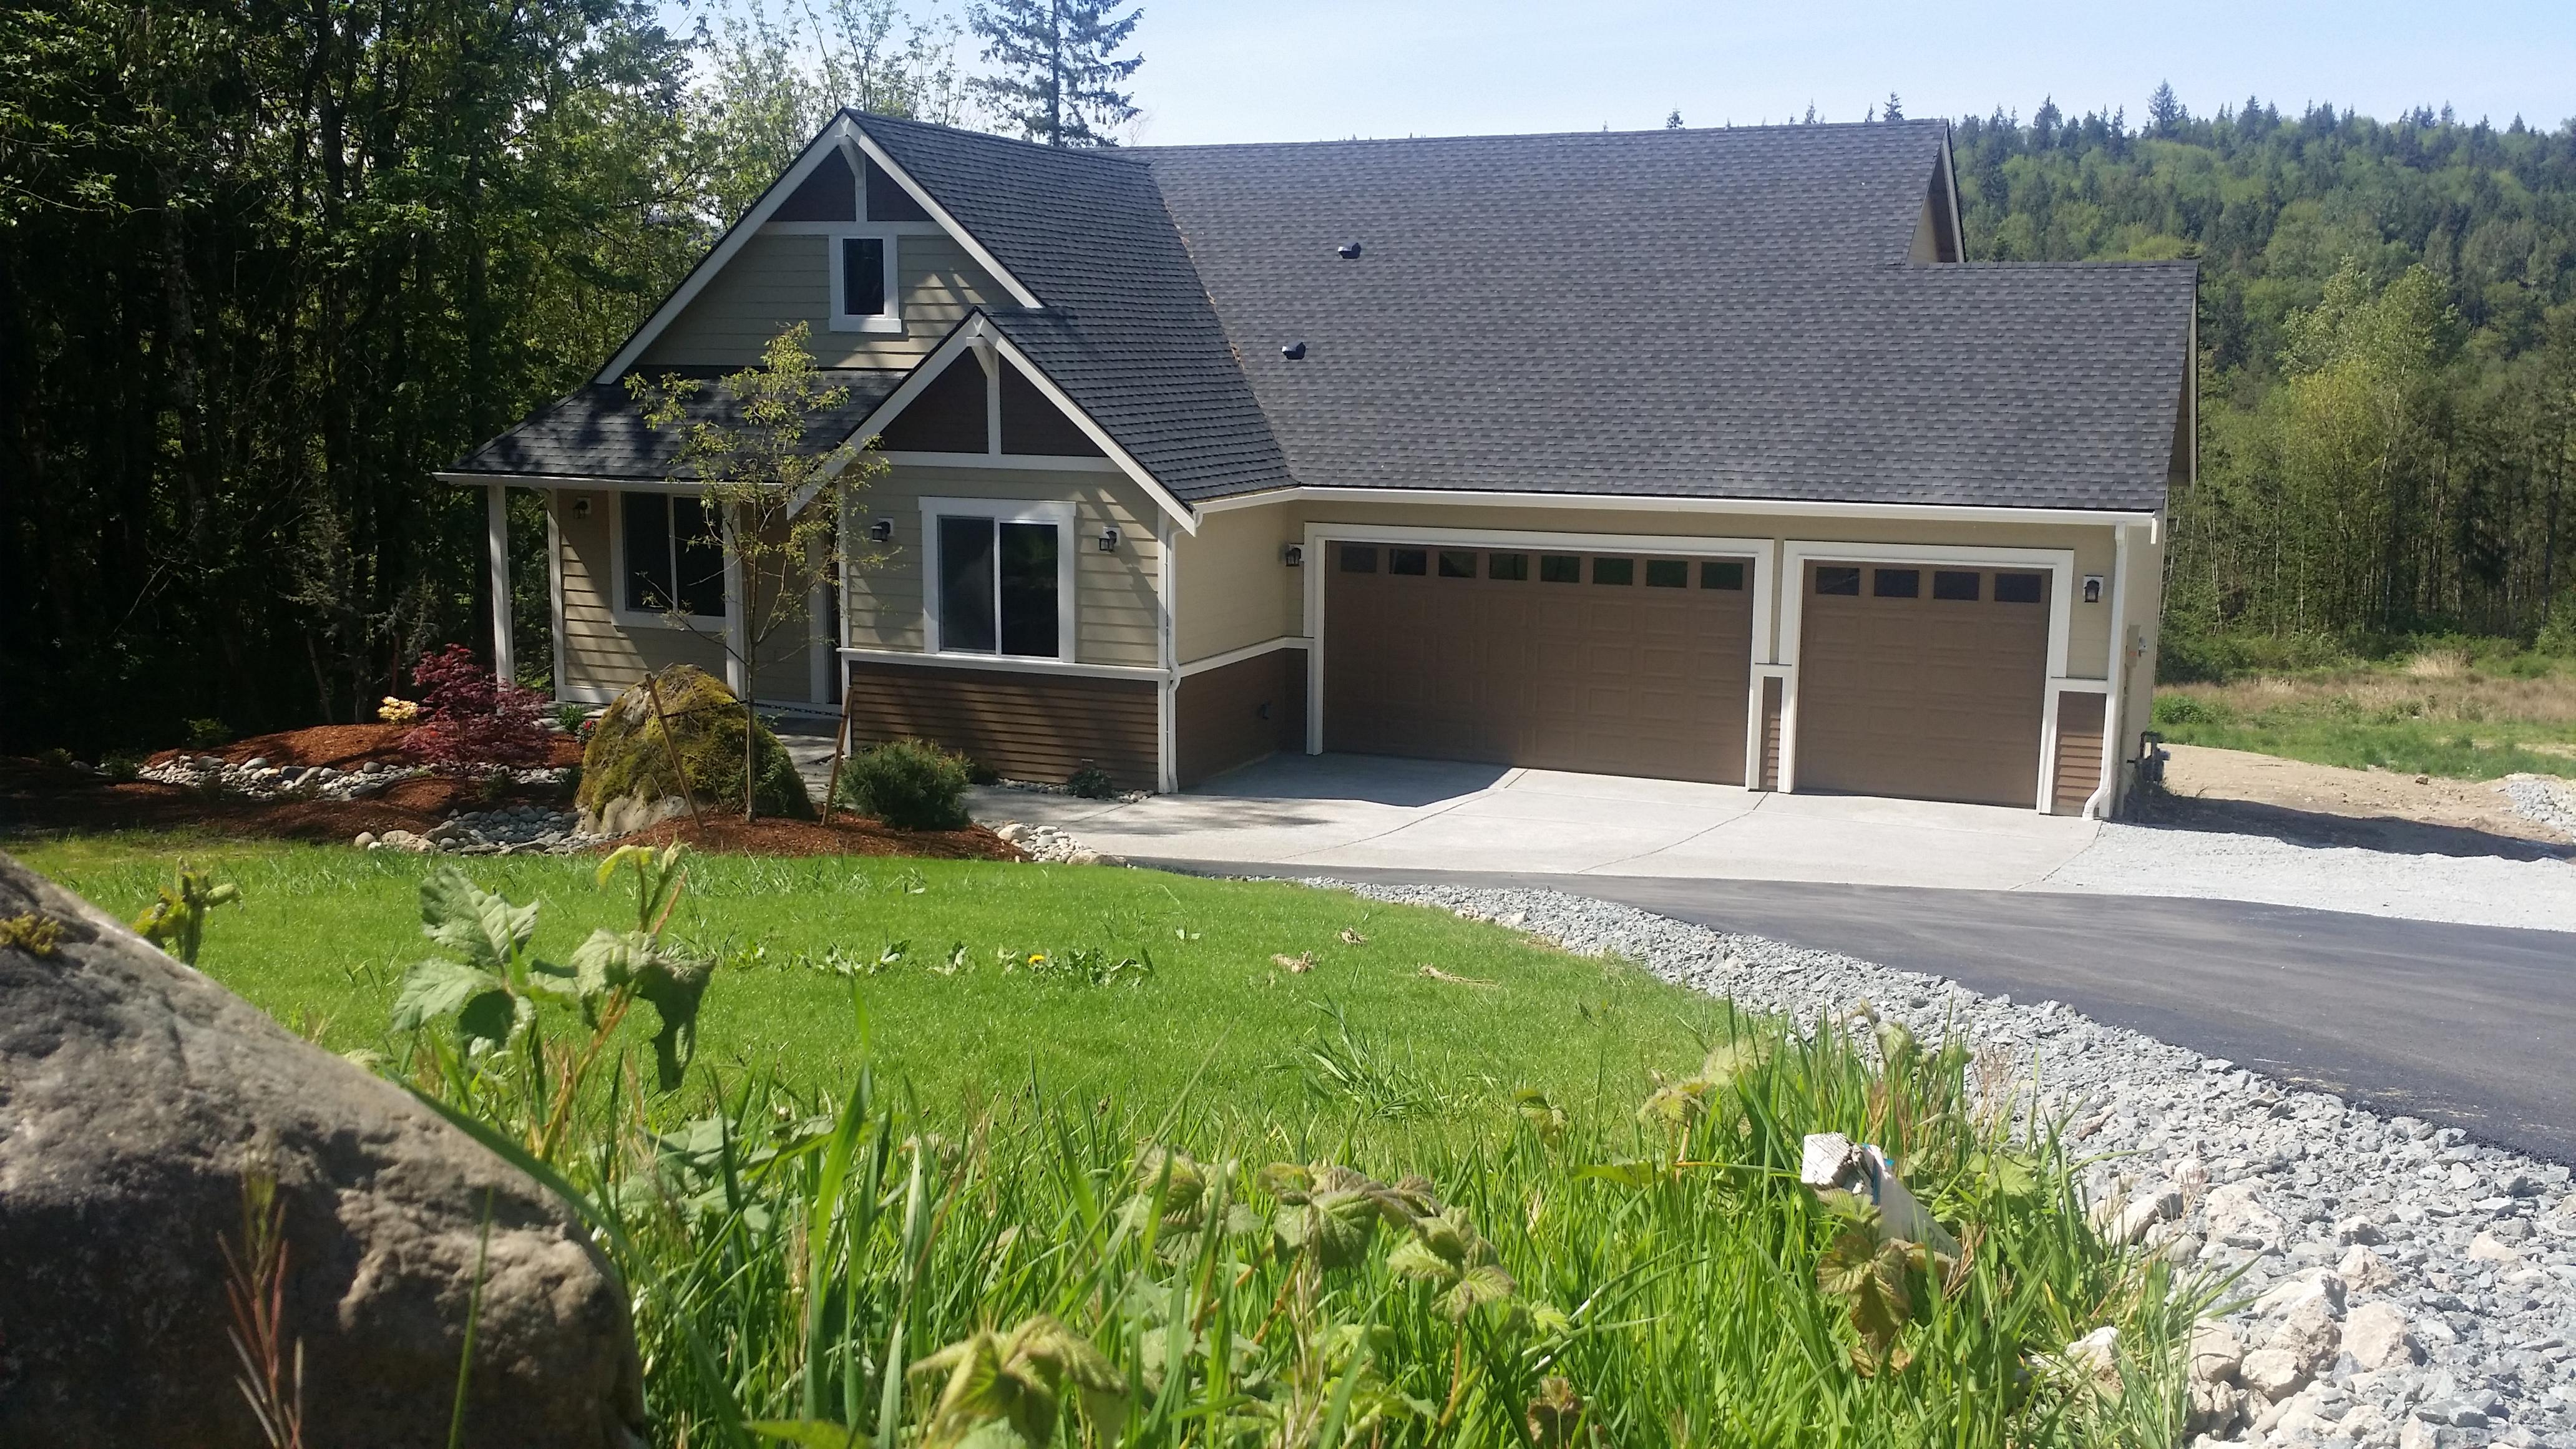 Reese Alexandria Homes, LLC